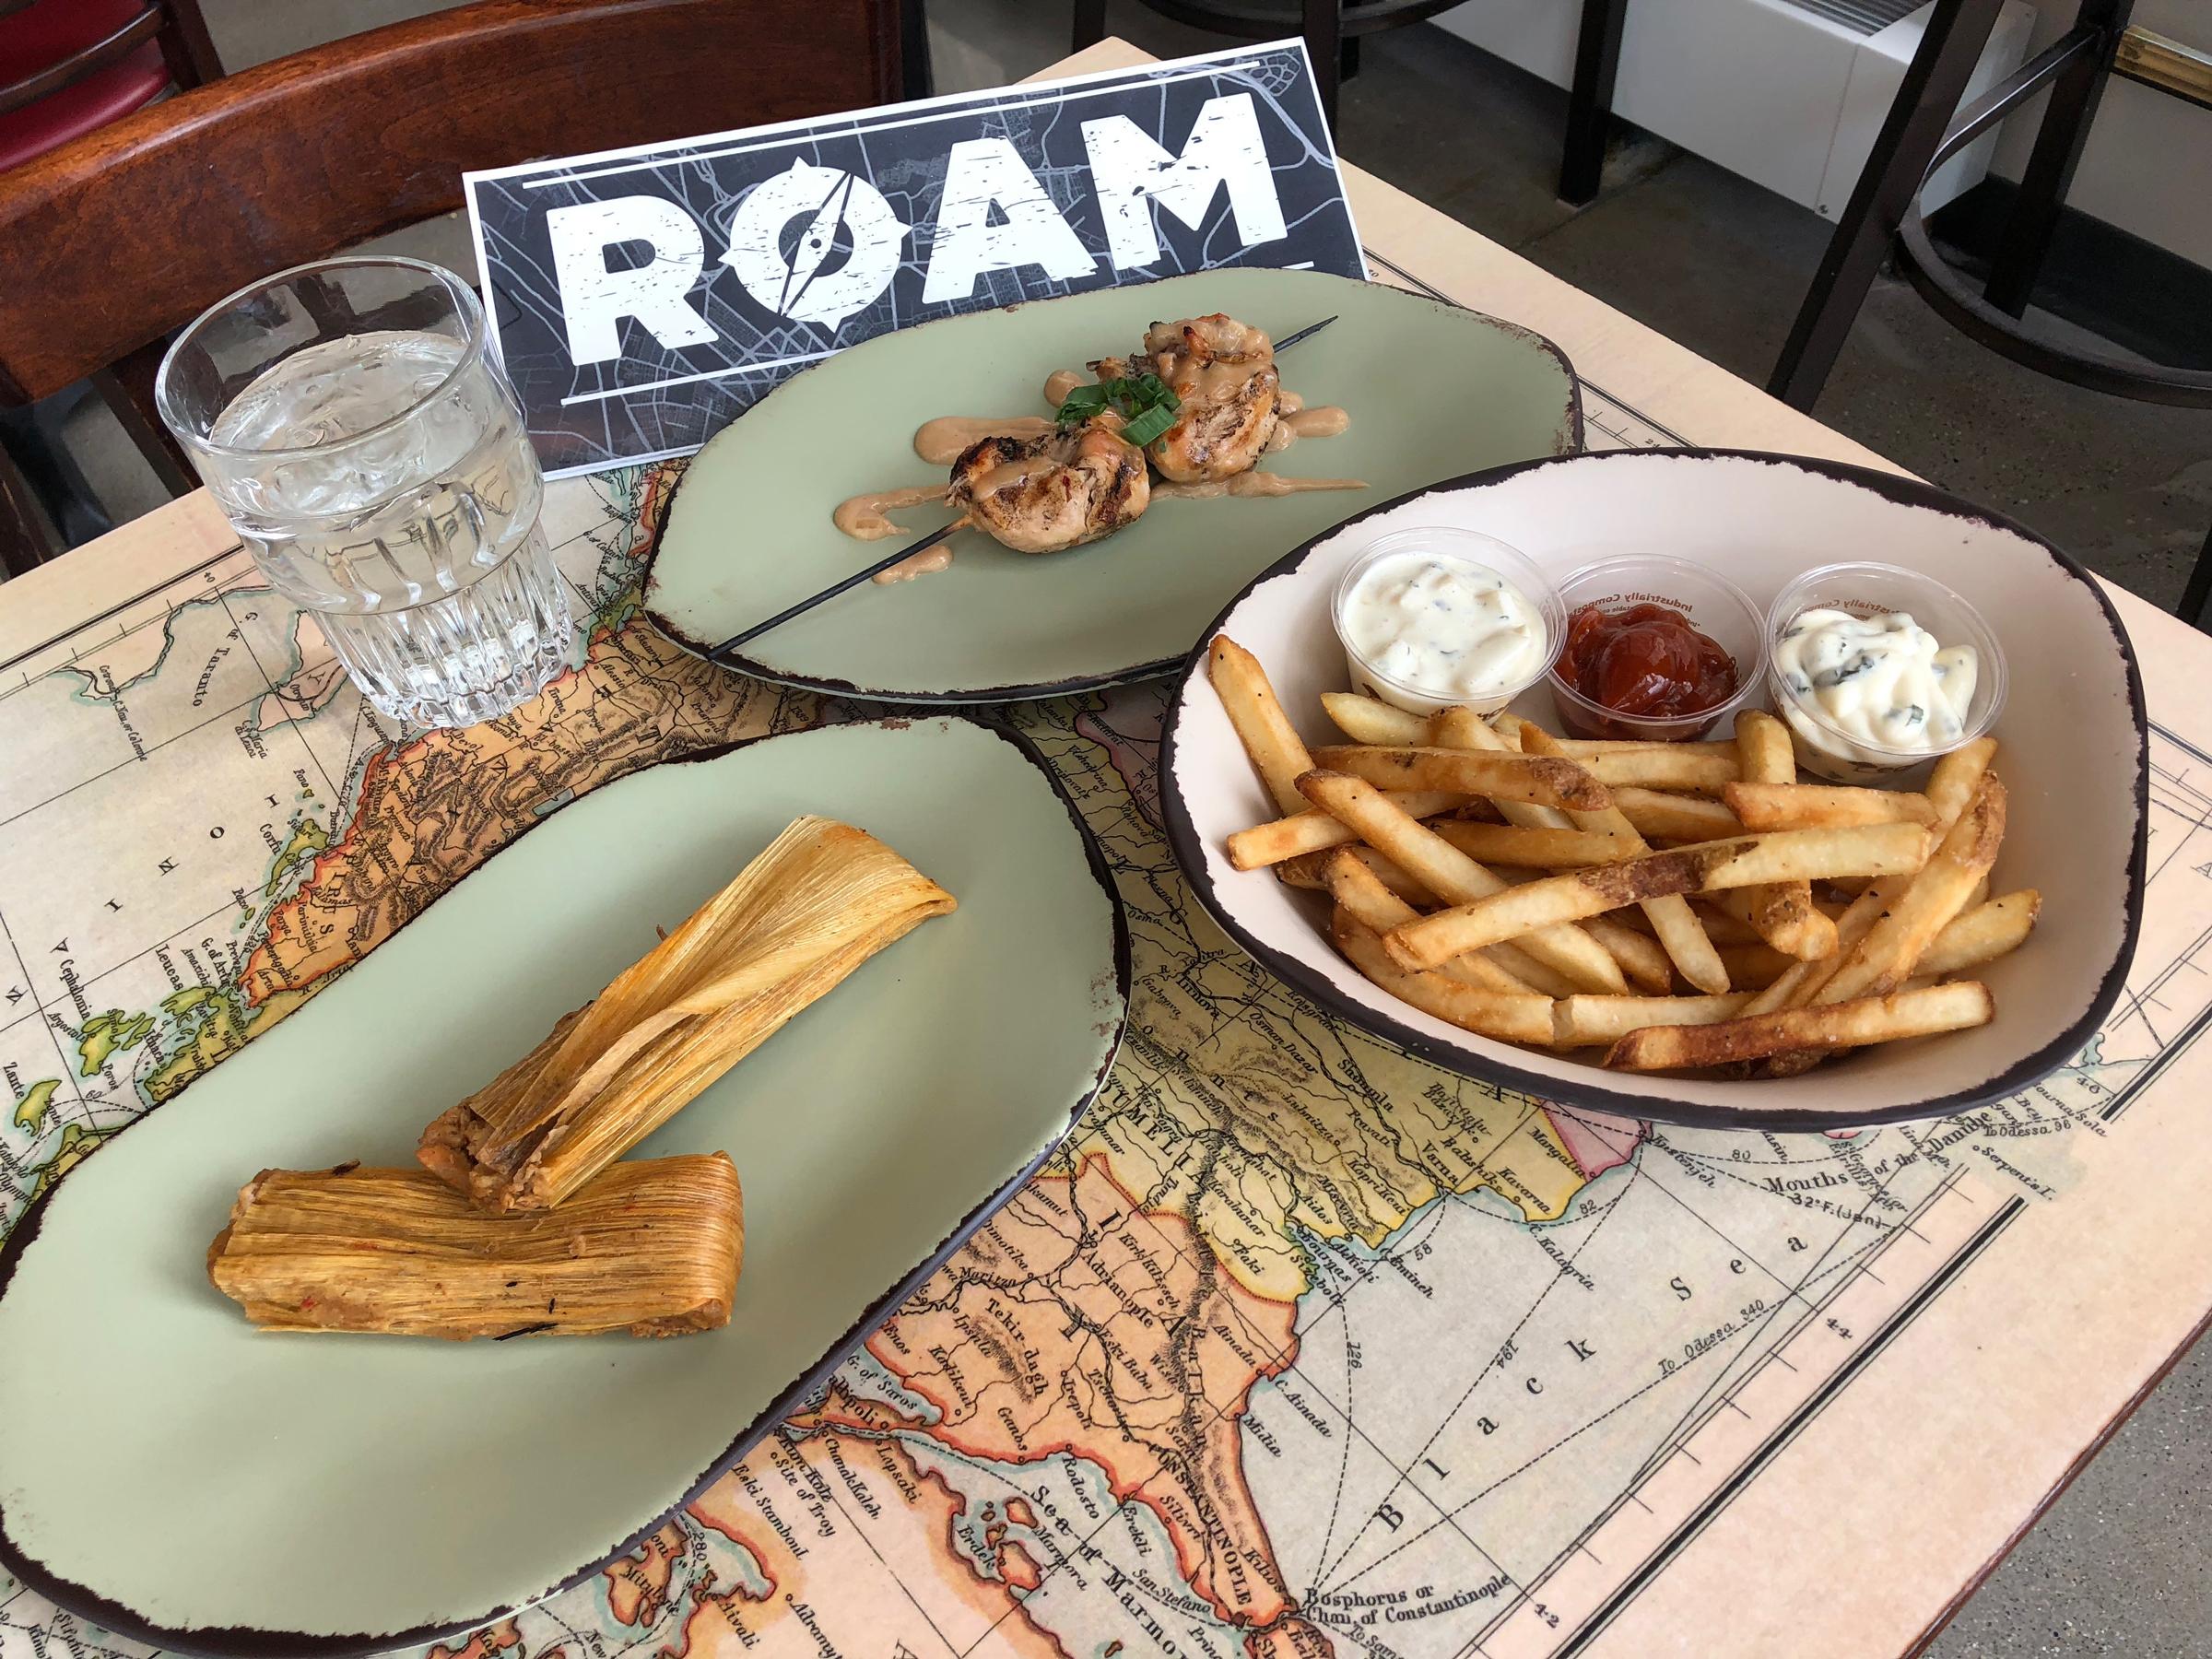 Roam's satay, tamales and chips 'n dips.